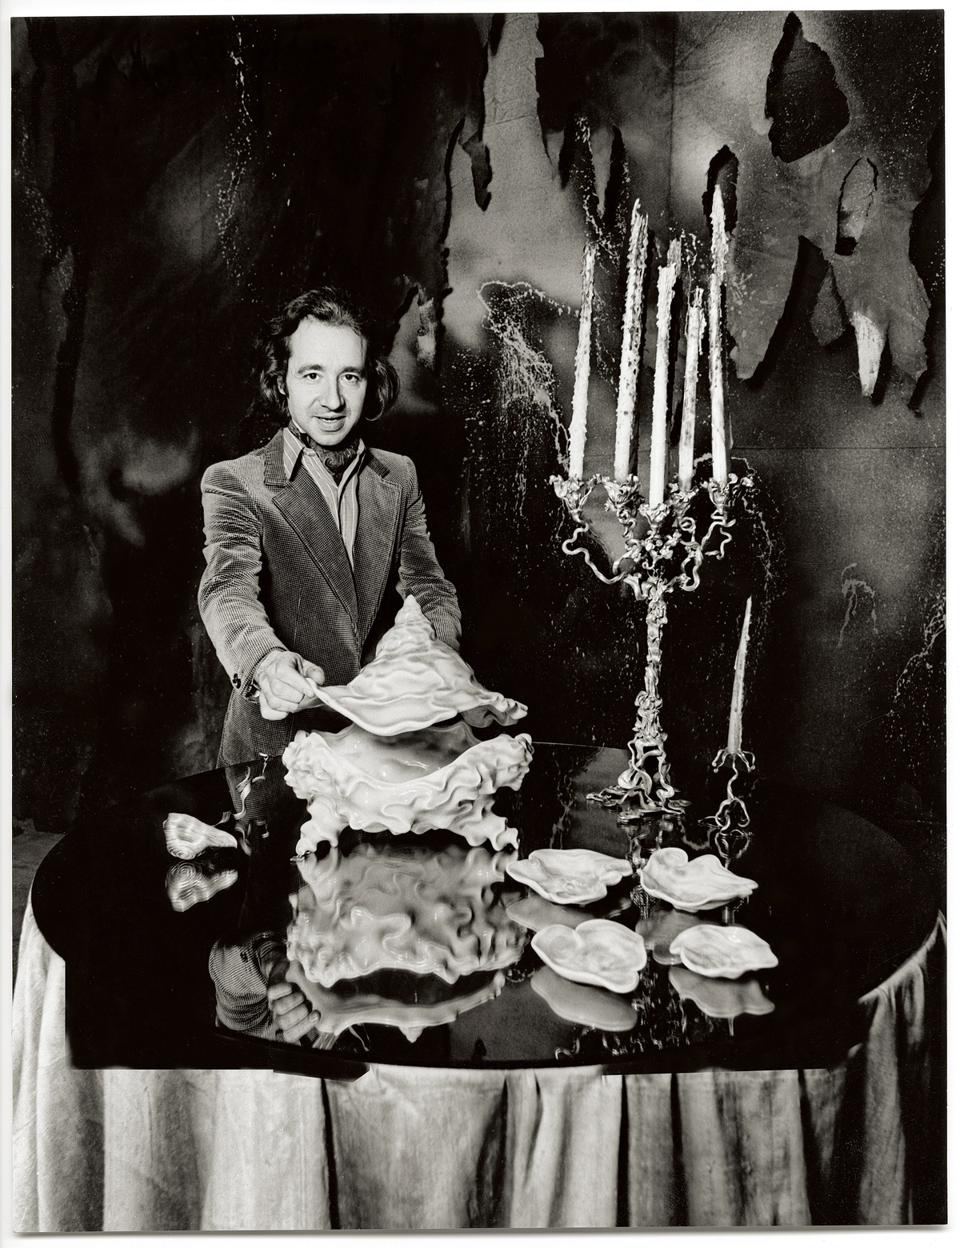 Danish artist Arje Griegst with Royal Copenhagen Triton tureen and bronze candelabra.